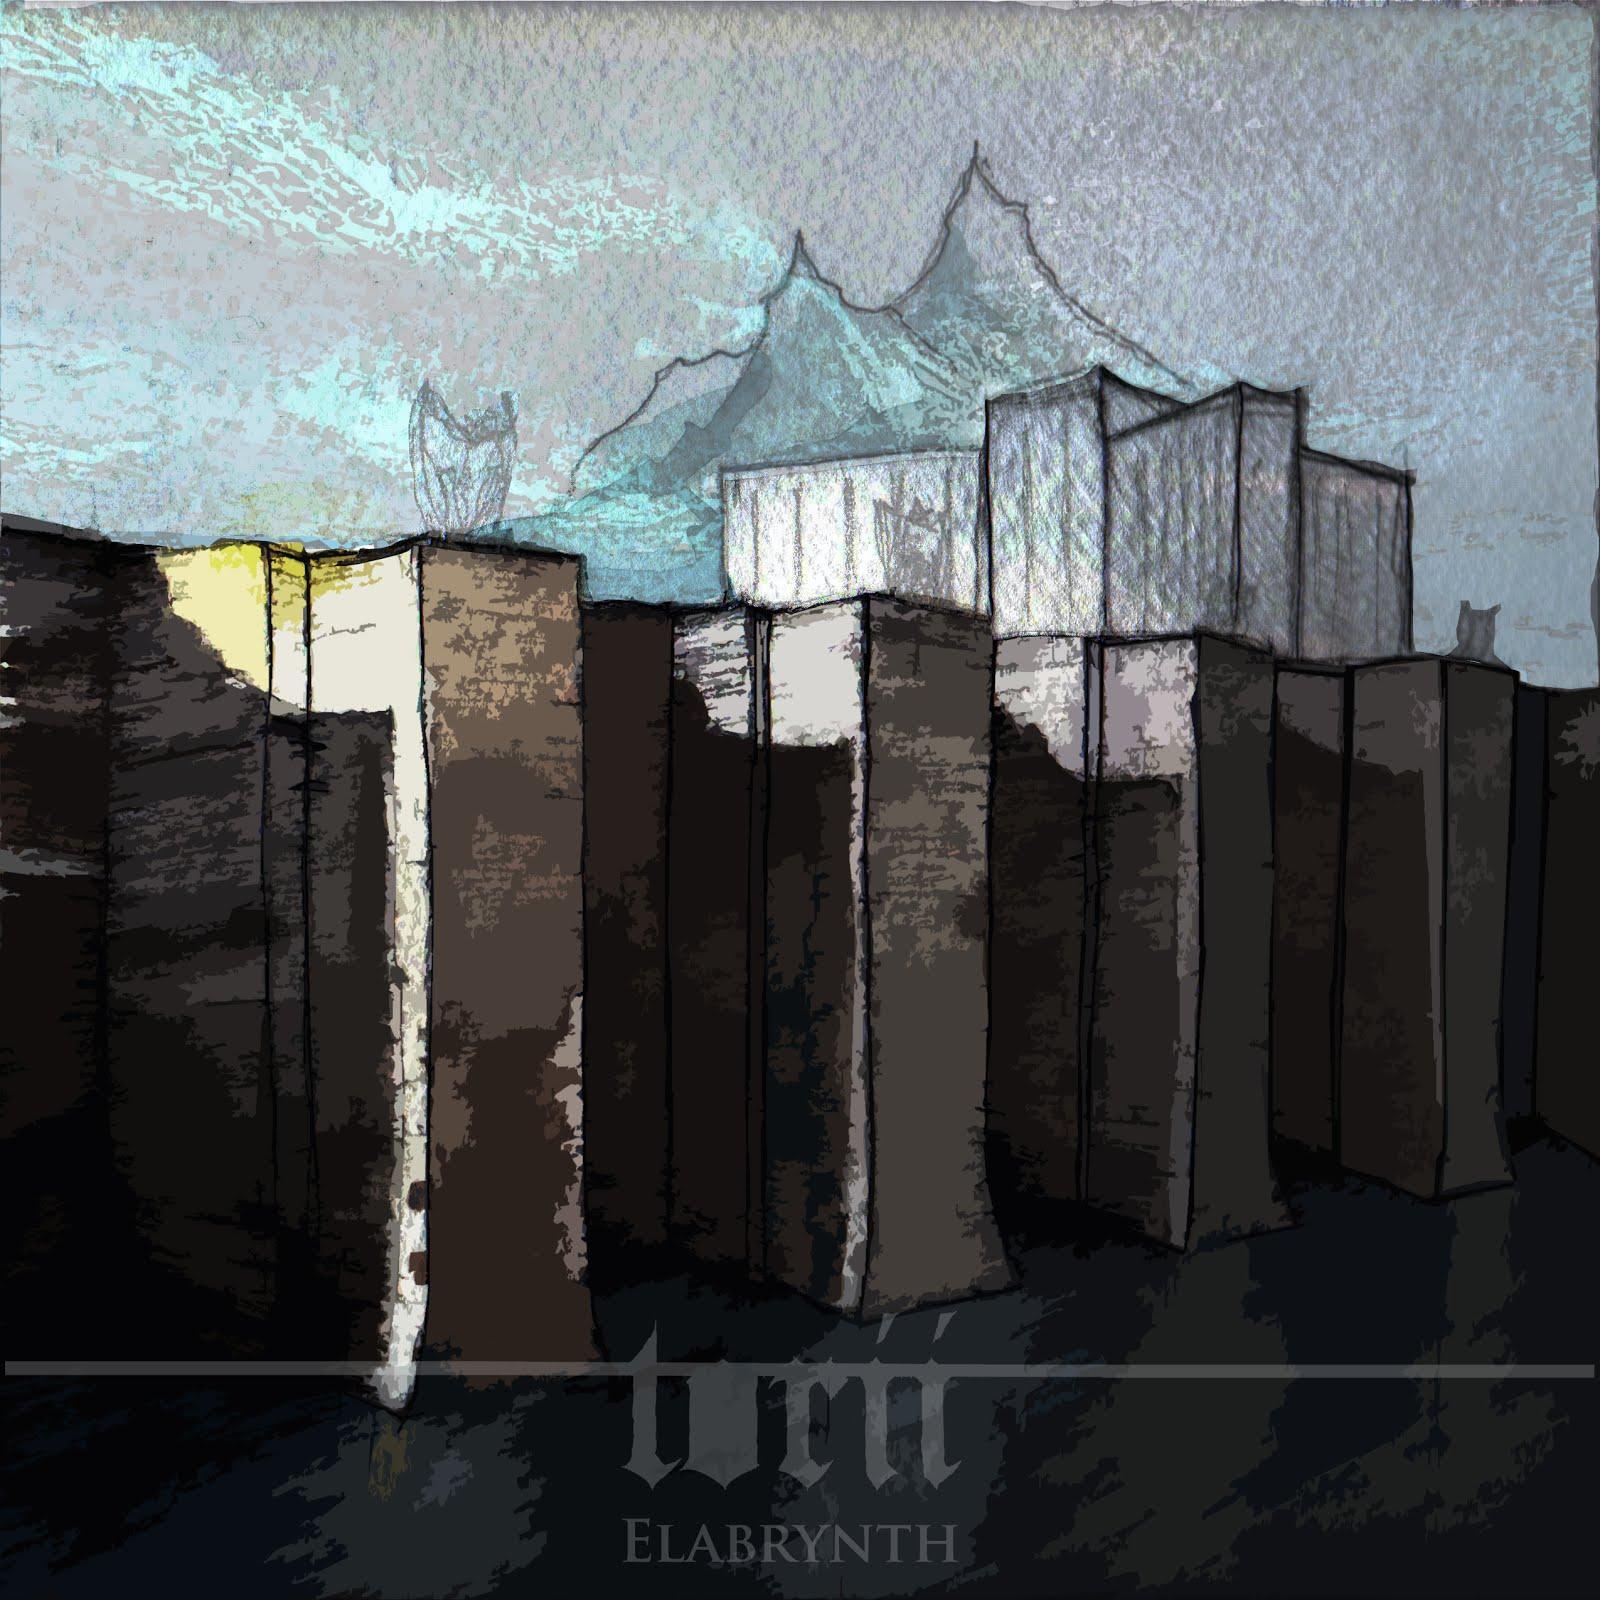 Torii Bandcamp (New Album Coming Soon)